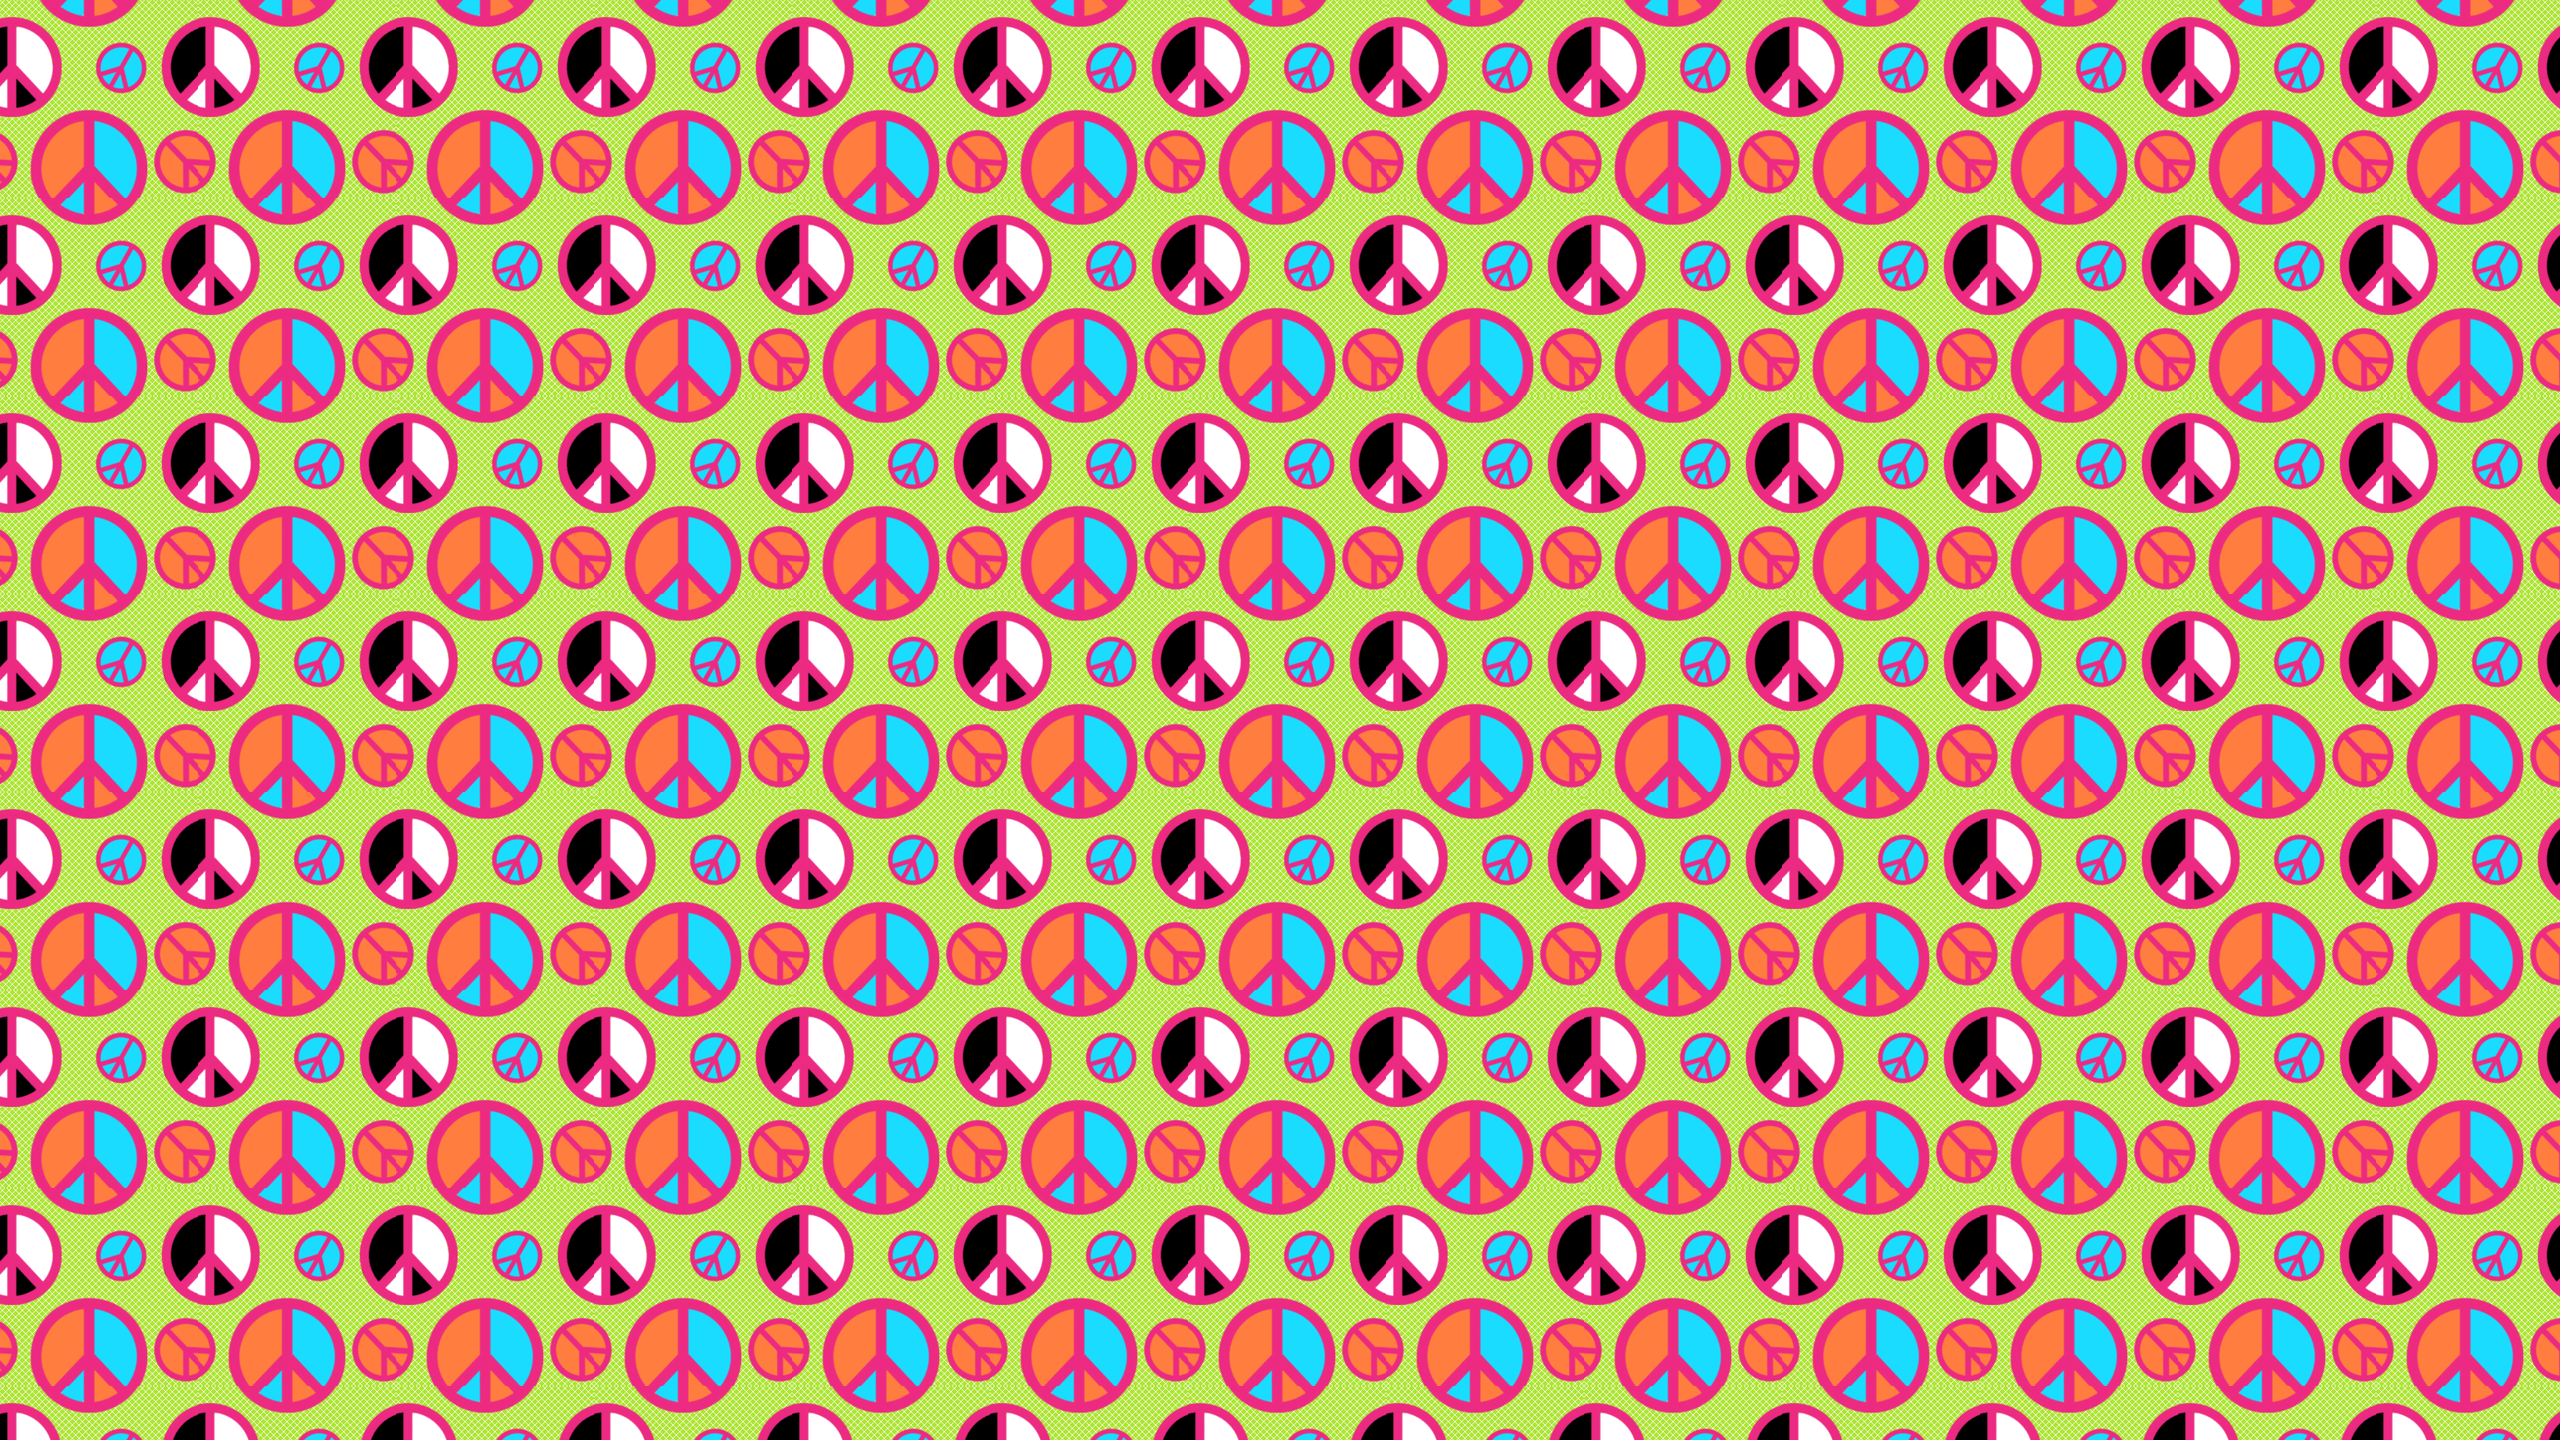 httpwwwsnazzyspacecomdesktop wallpaper000000 lime peace signs 2560x1440